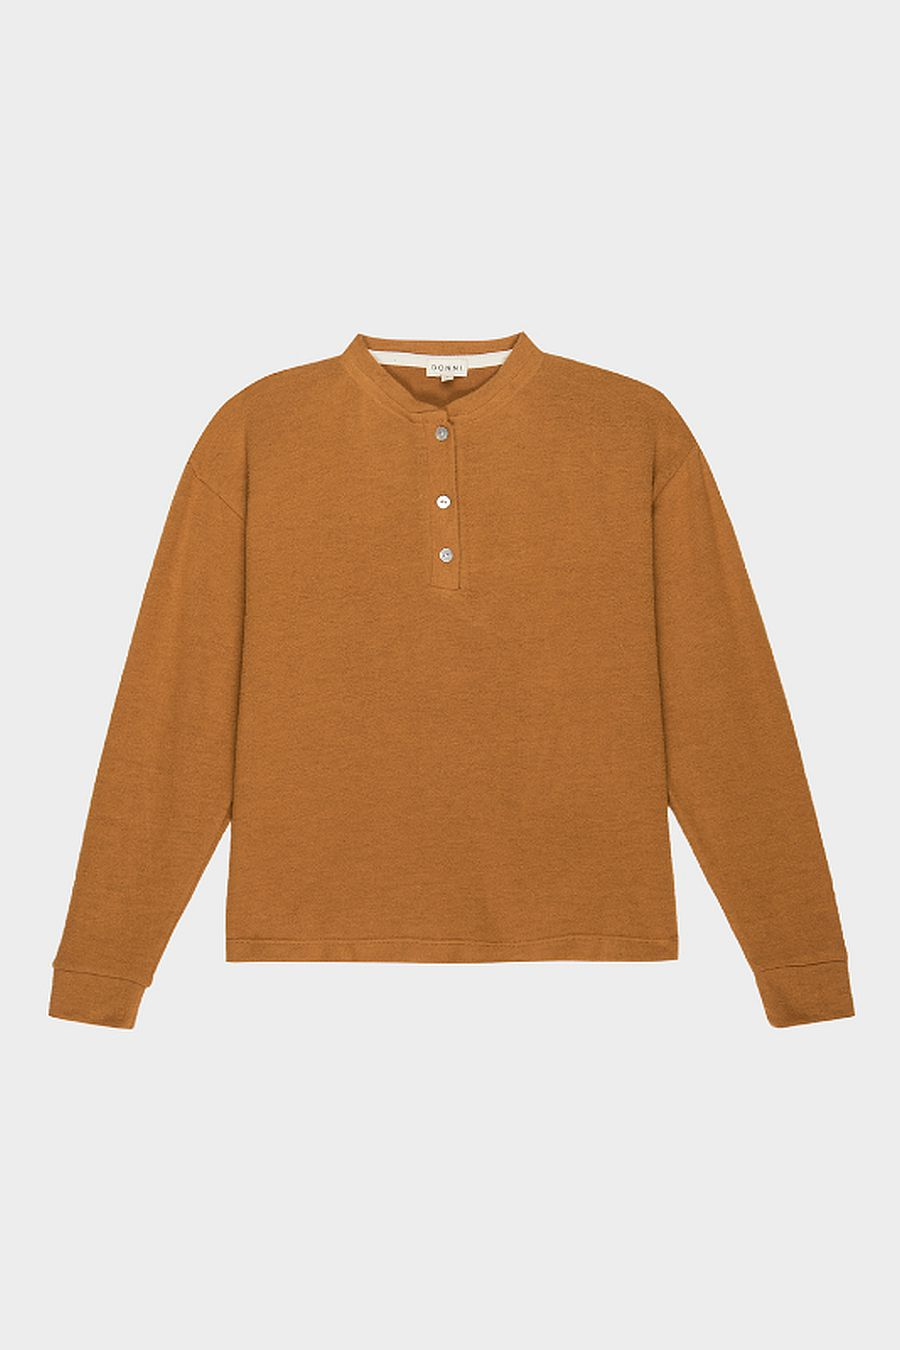 DONNI. Sweater Henley - Dijon